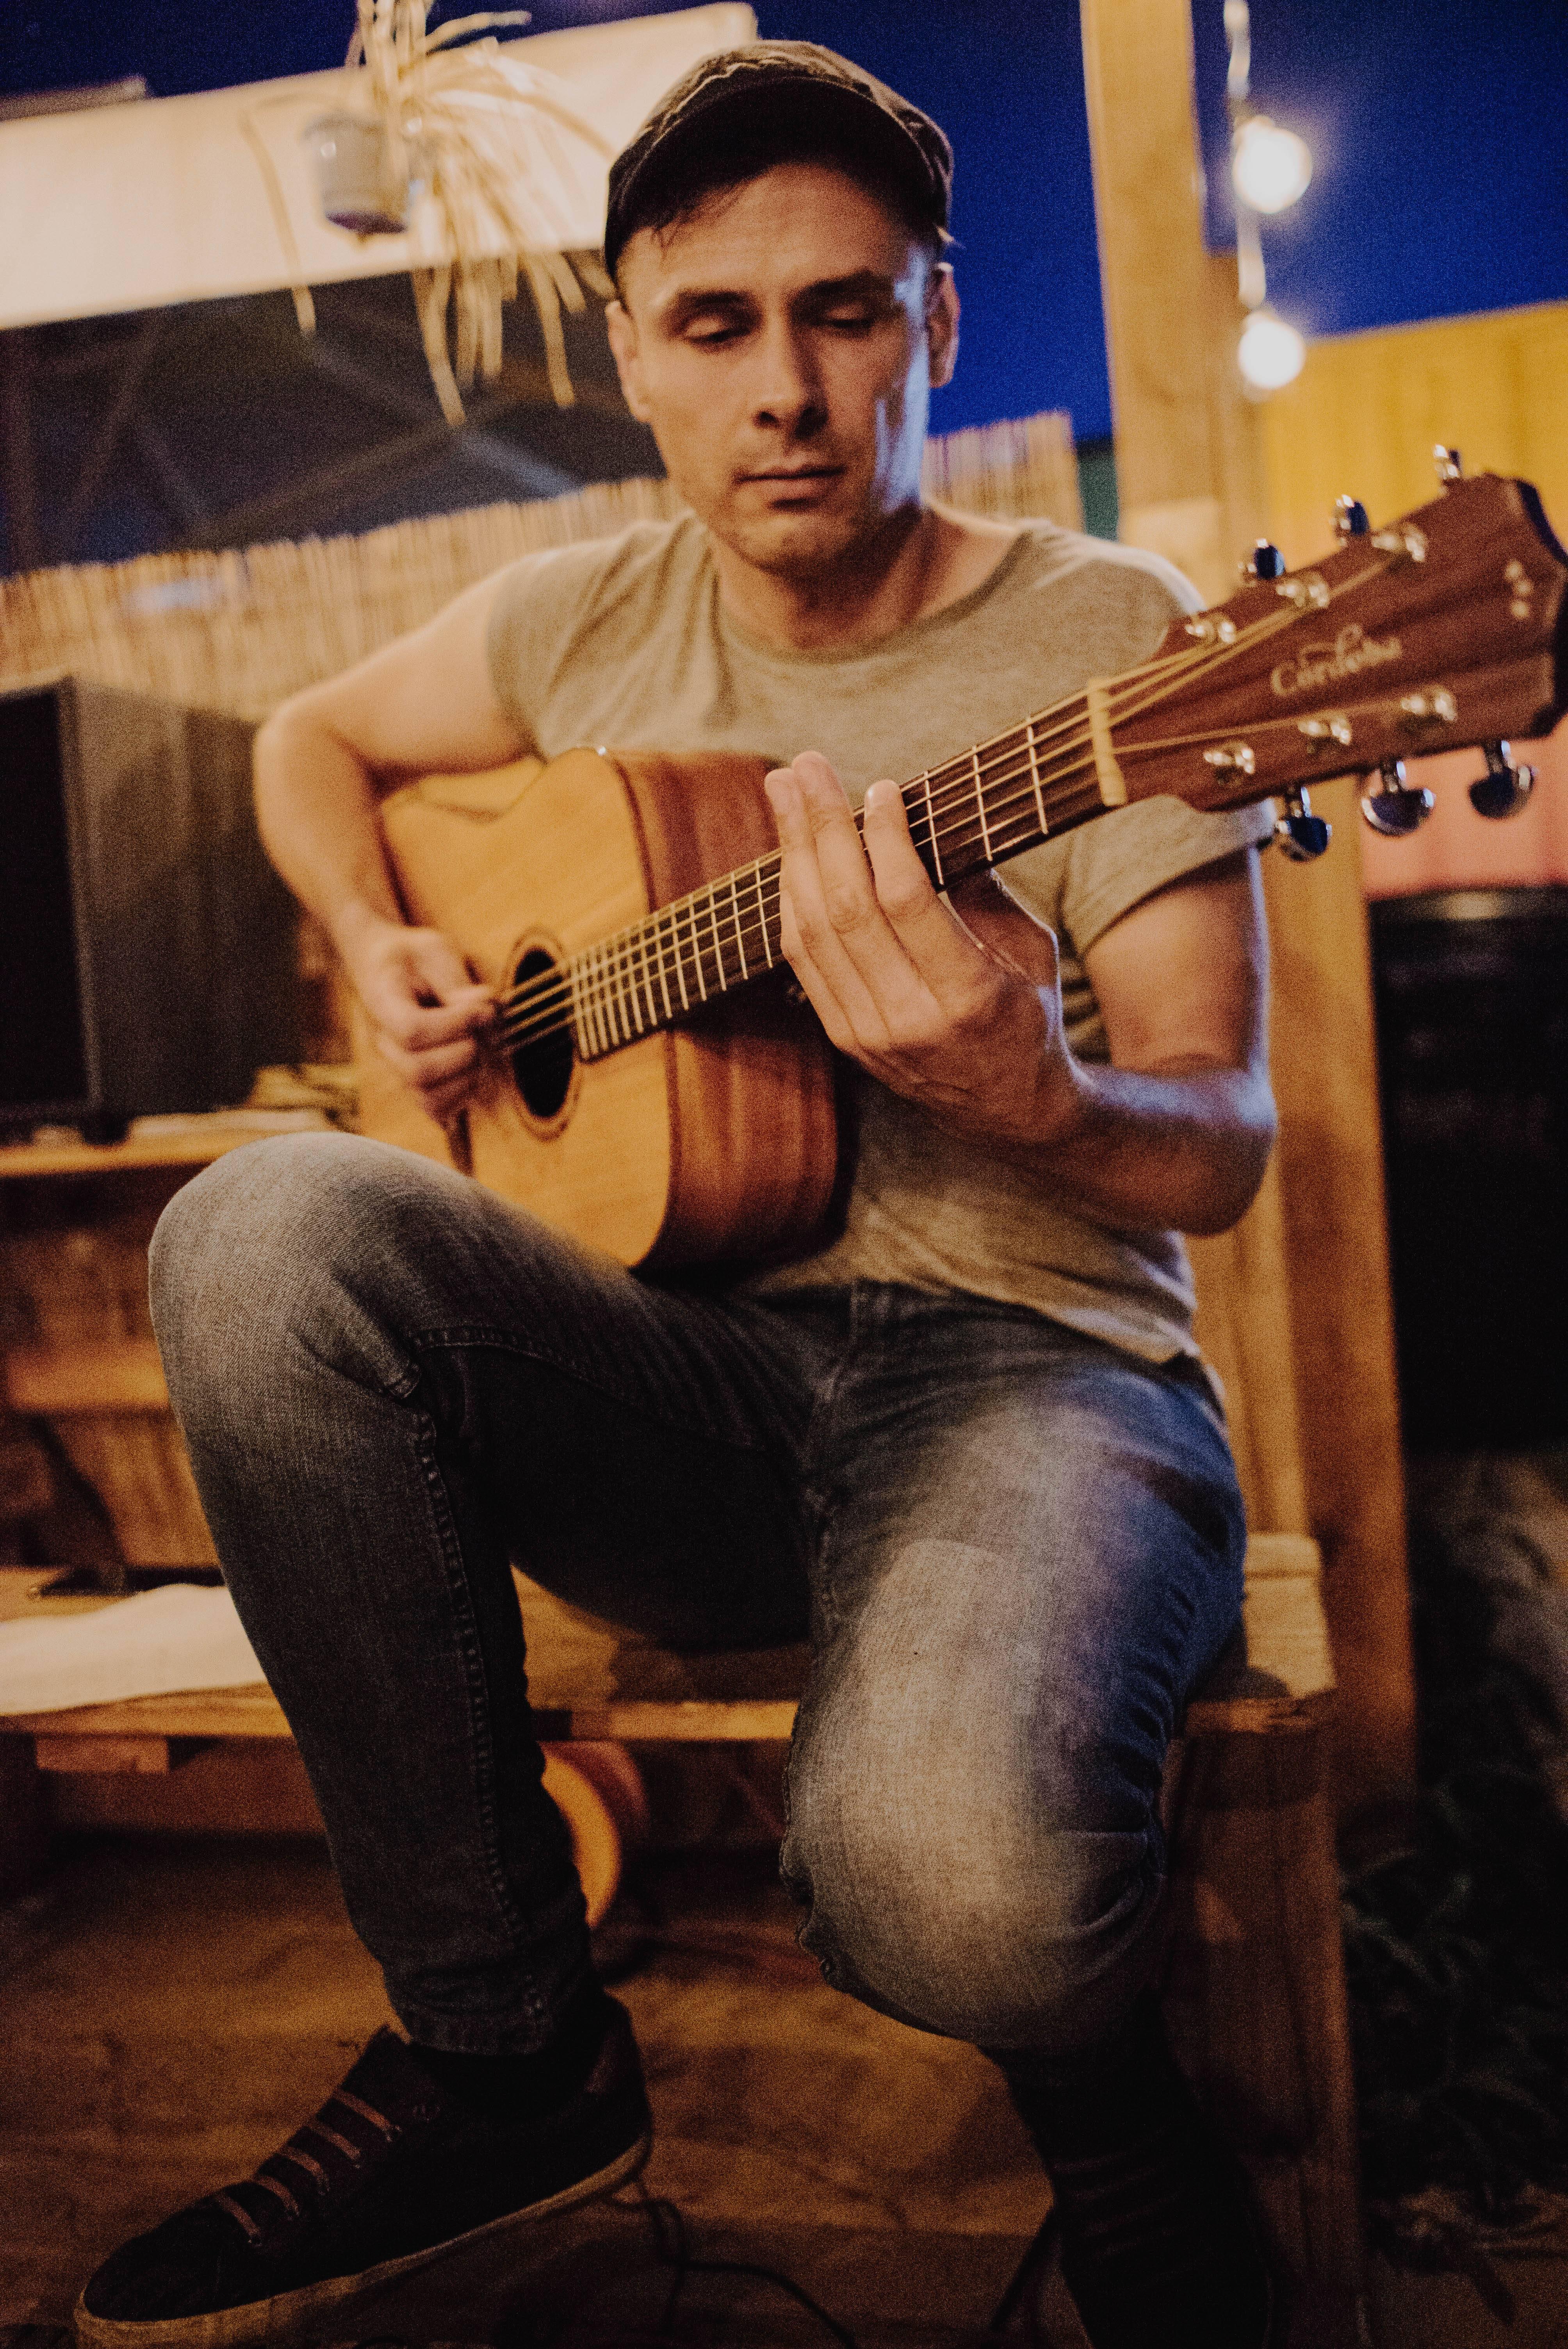 nauka gry na gitarze leśnica